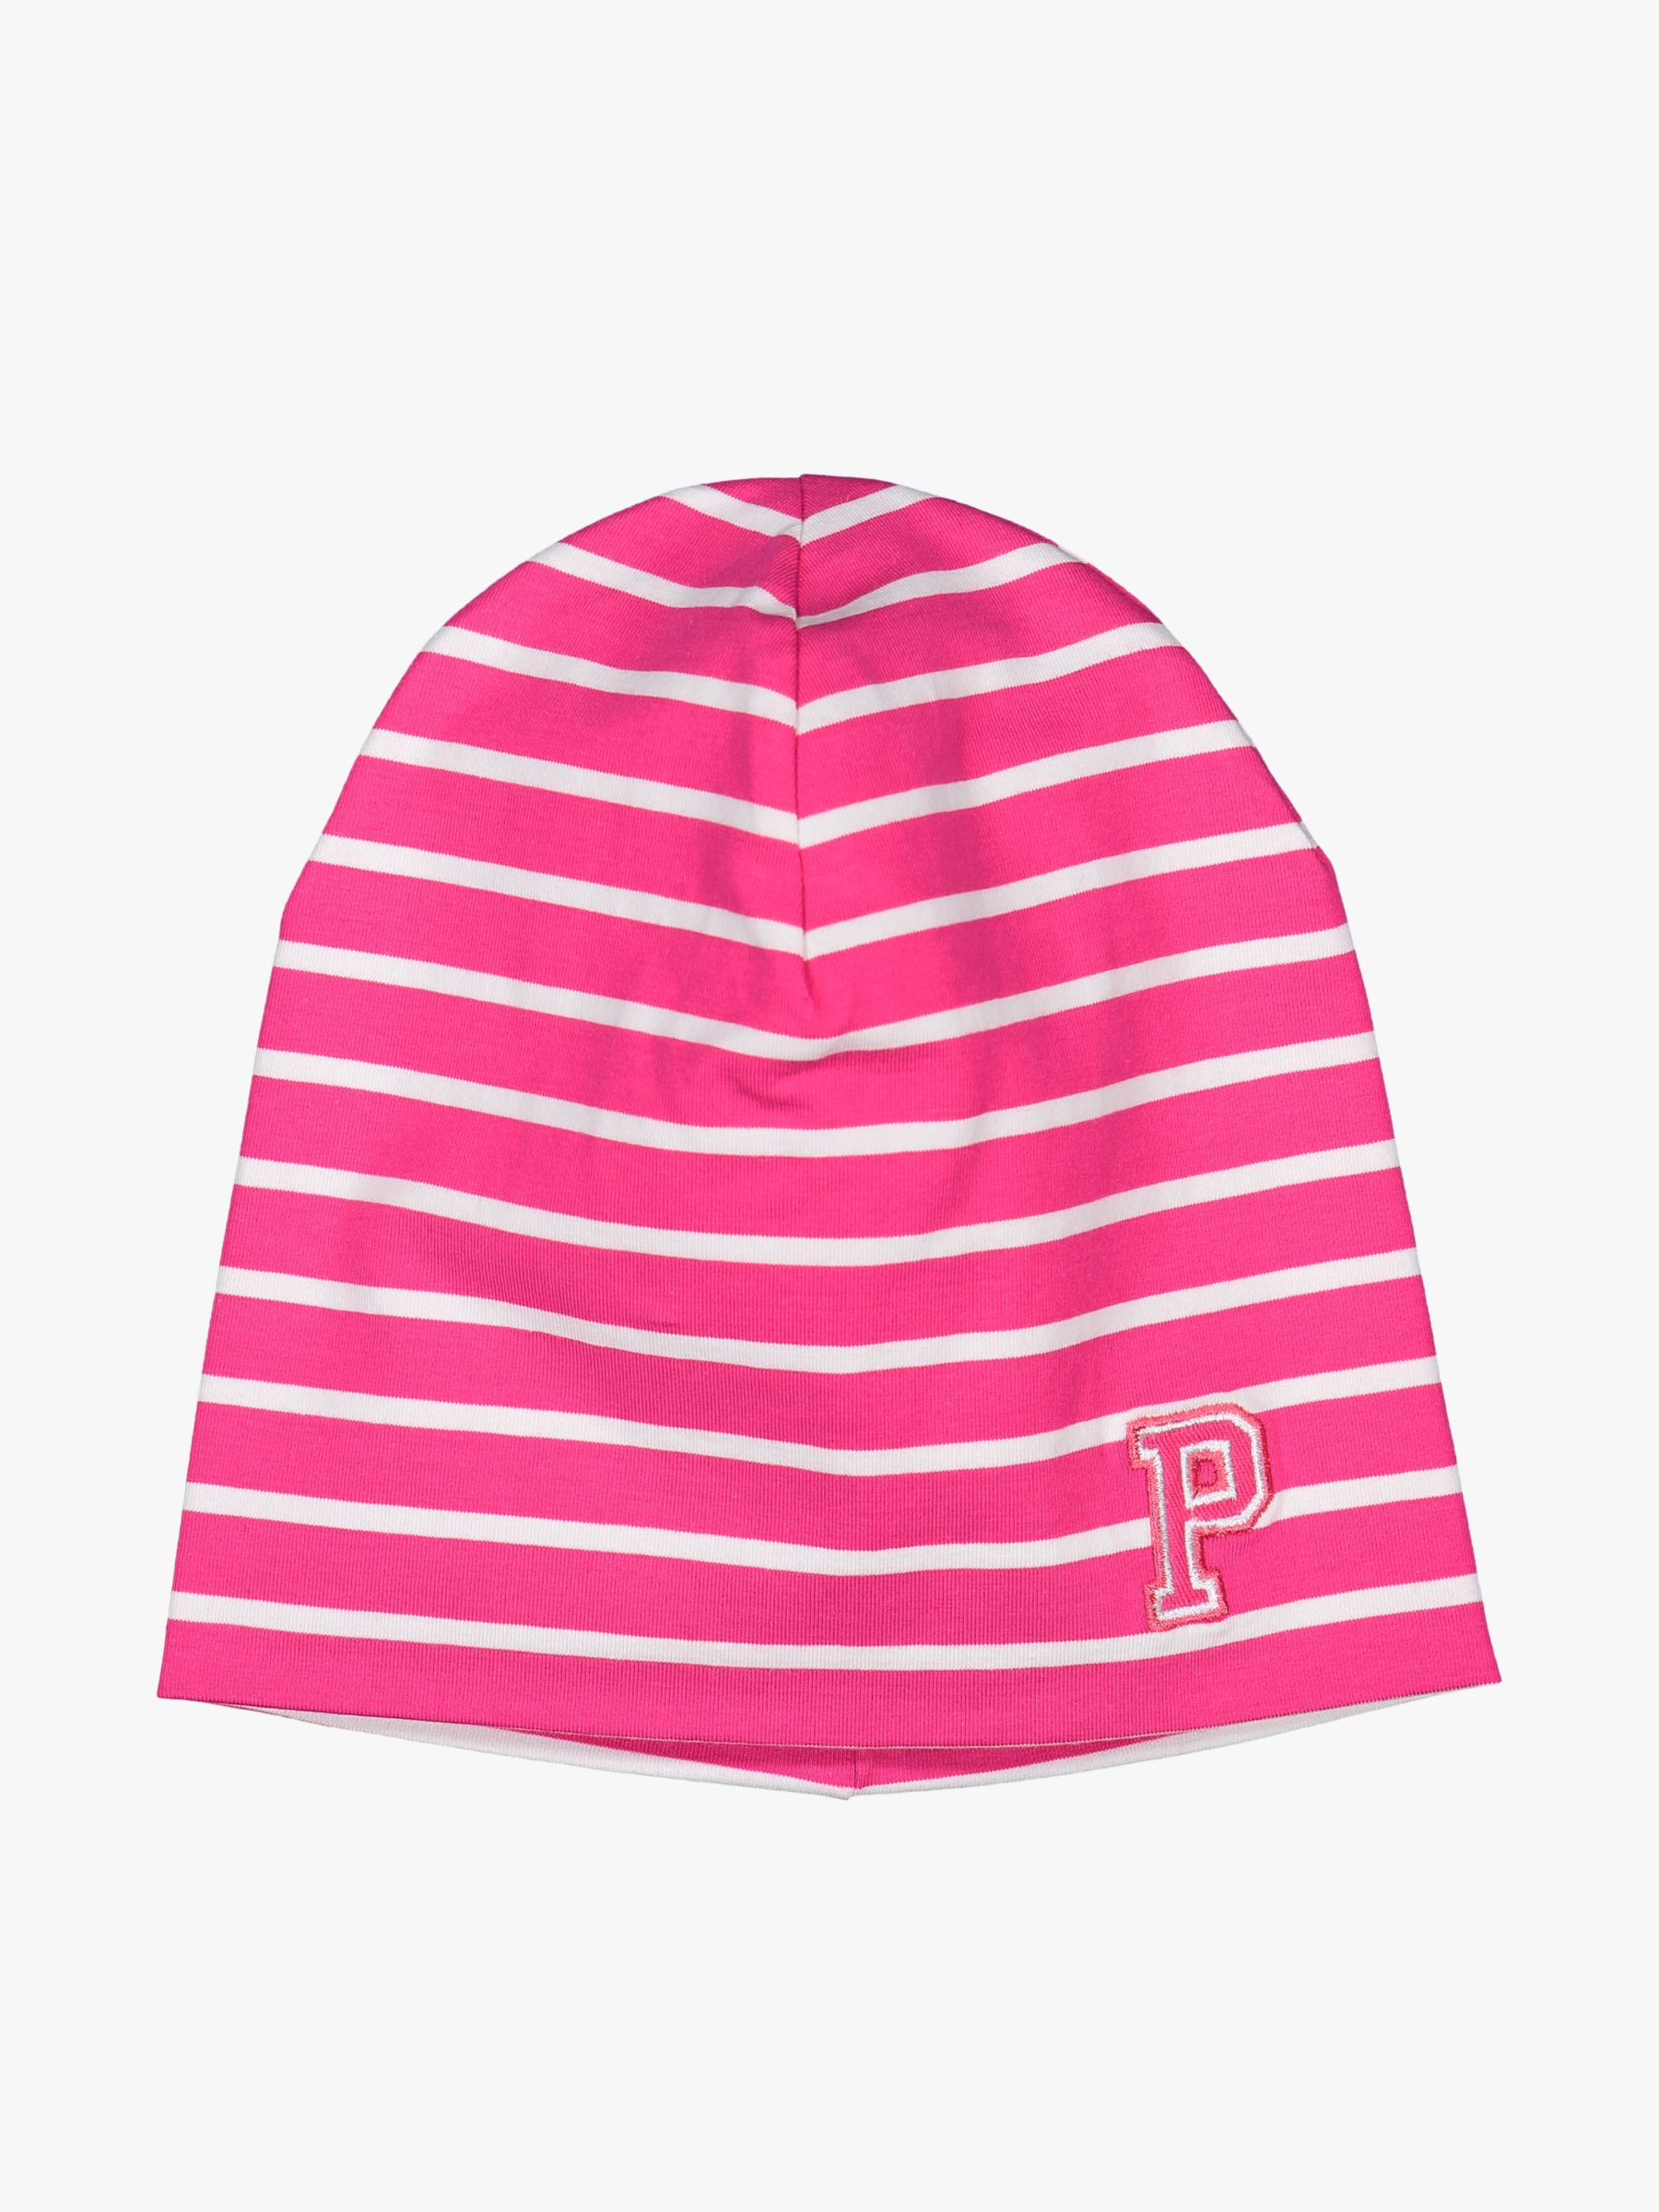 Polarn O. Pyret Polarn O. Pyret Children's Stripe Beanie Hat